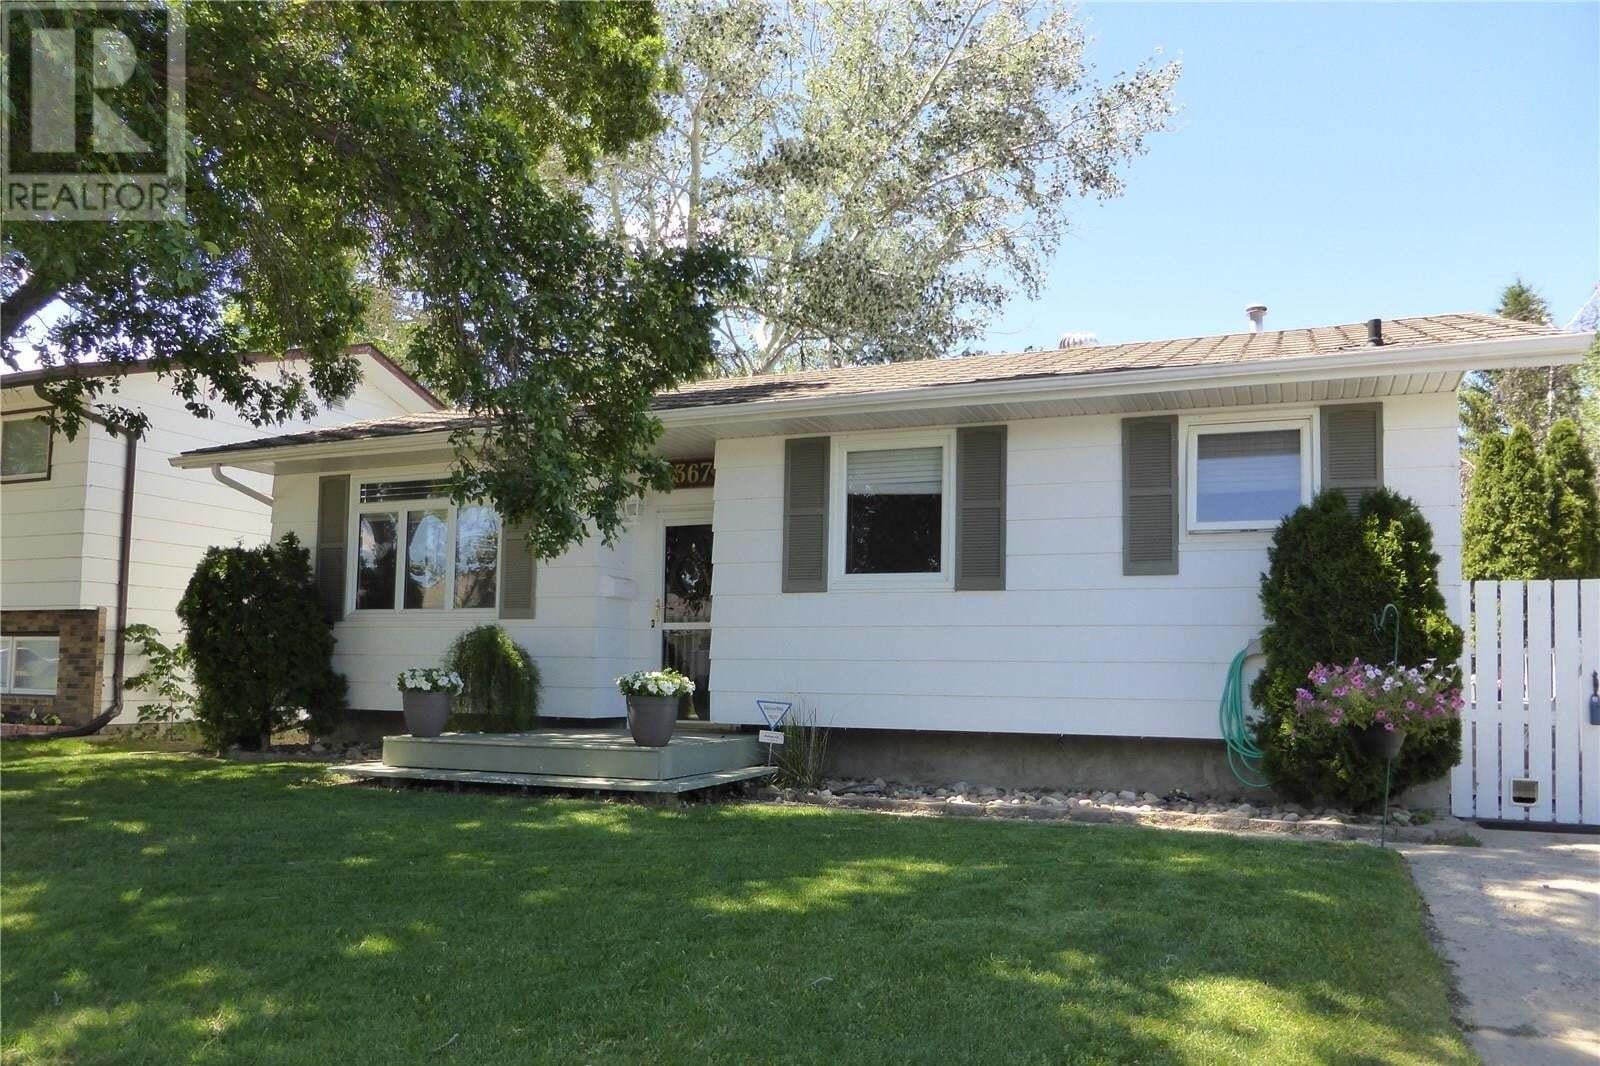 House for sale at 1367 Manitou Cres Moose Jaw Saskatchewan - MLS: SK812795